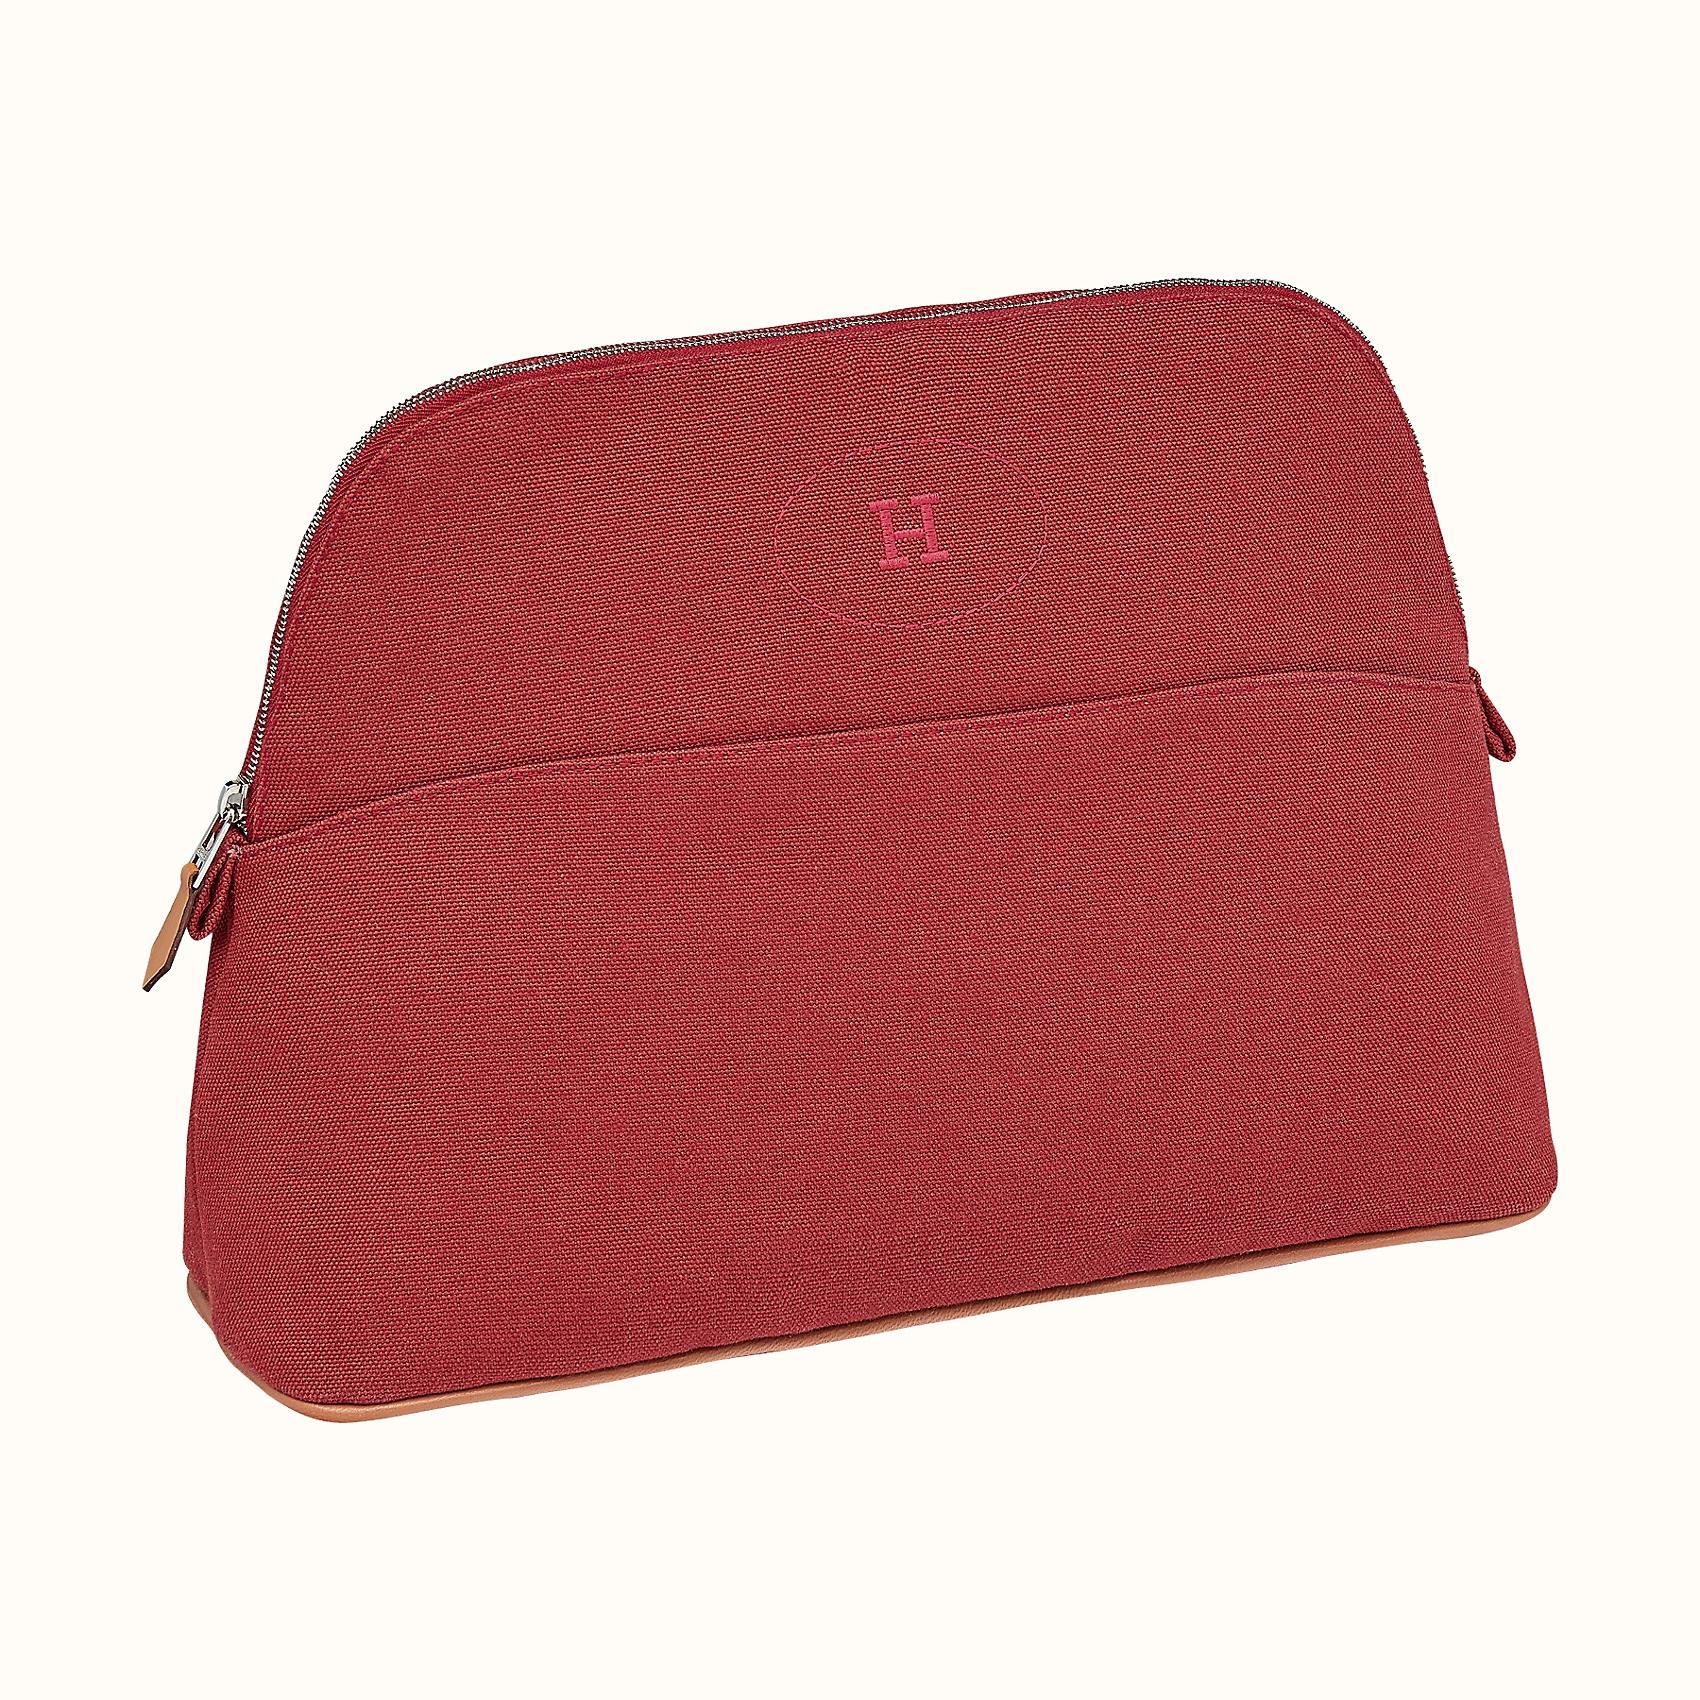 HERMES Bolide 31 travel case - Rouge H